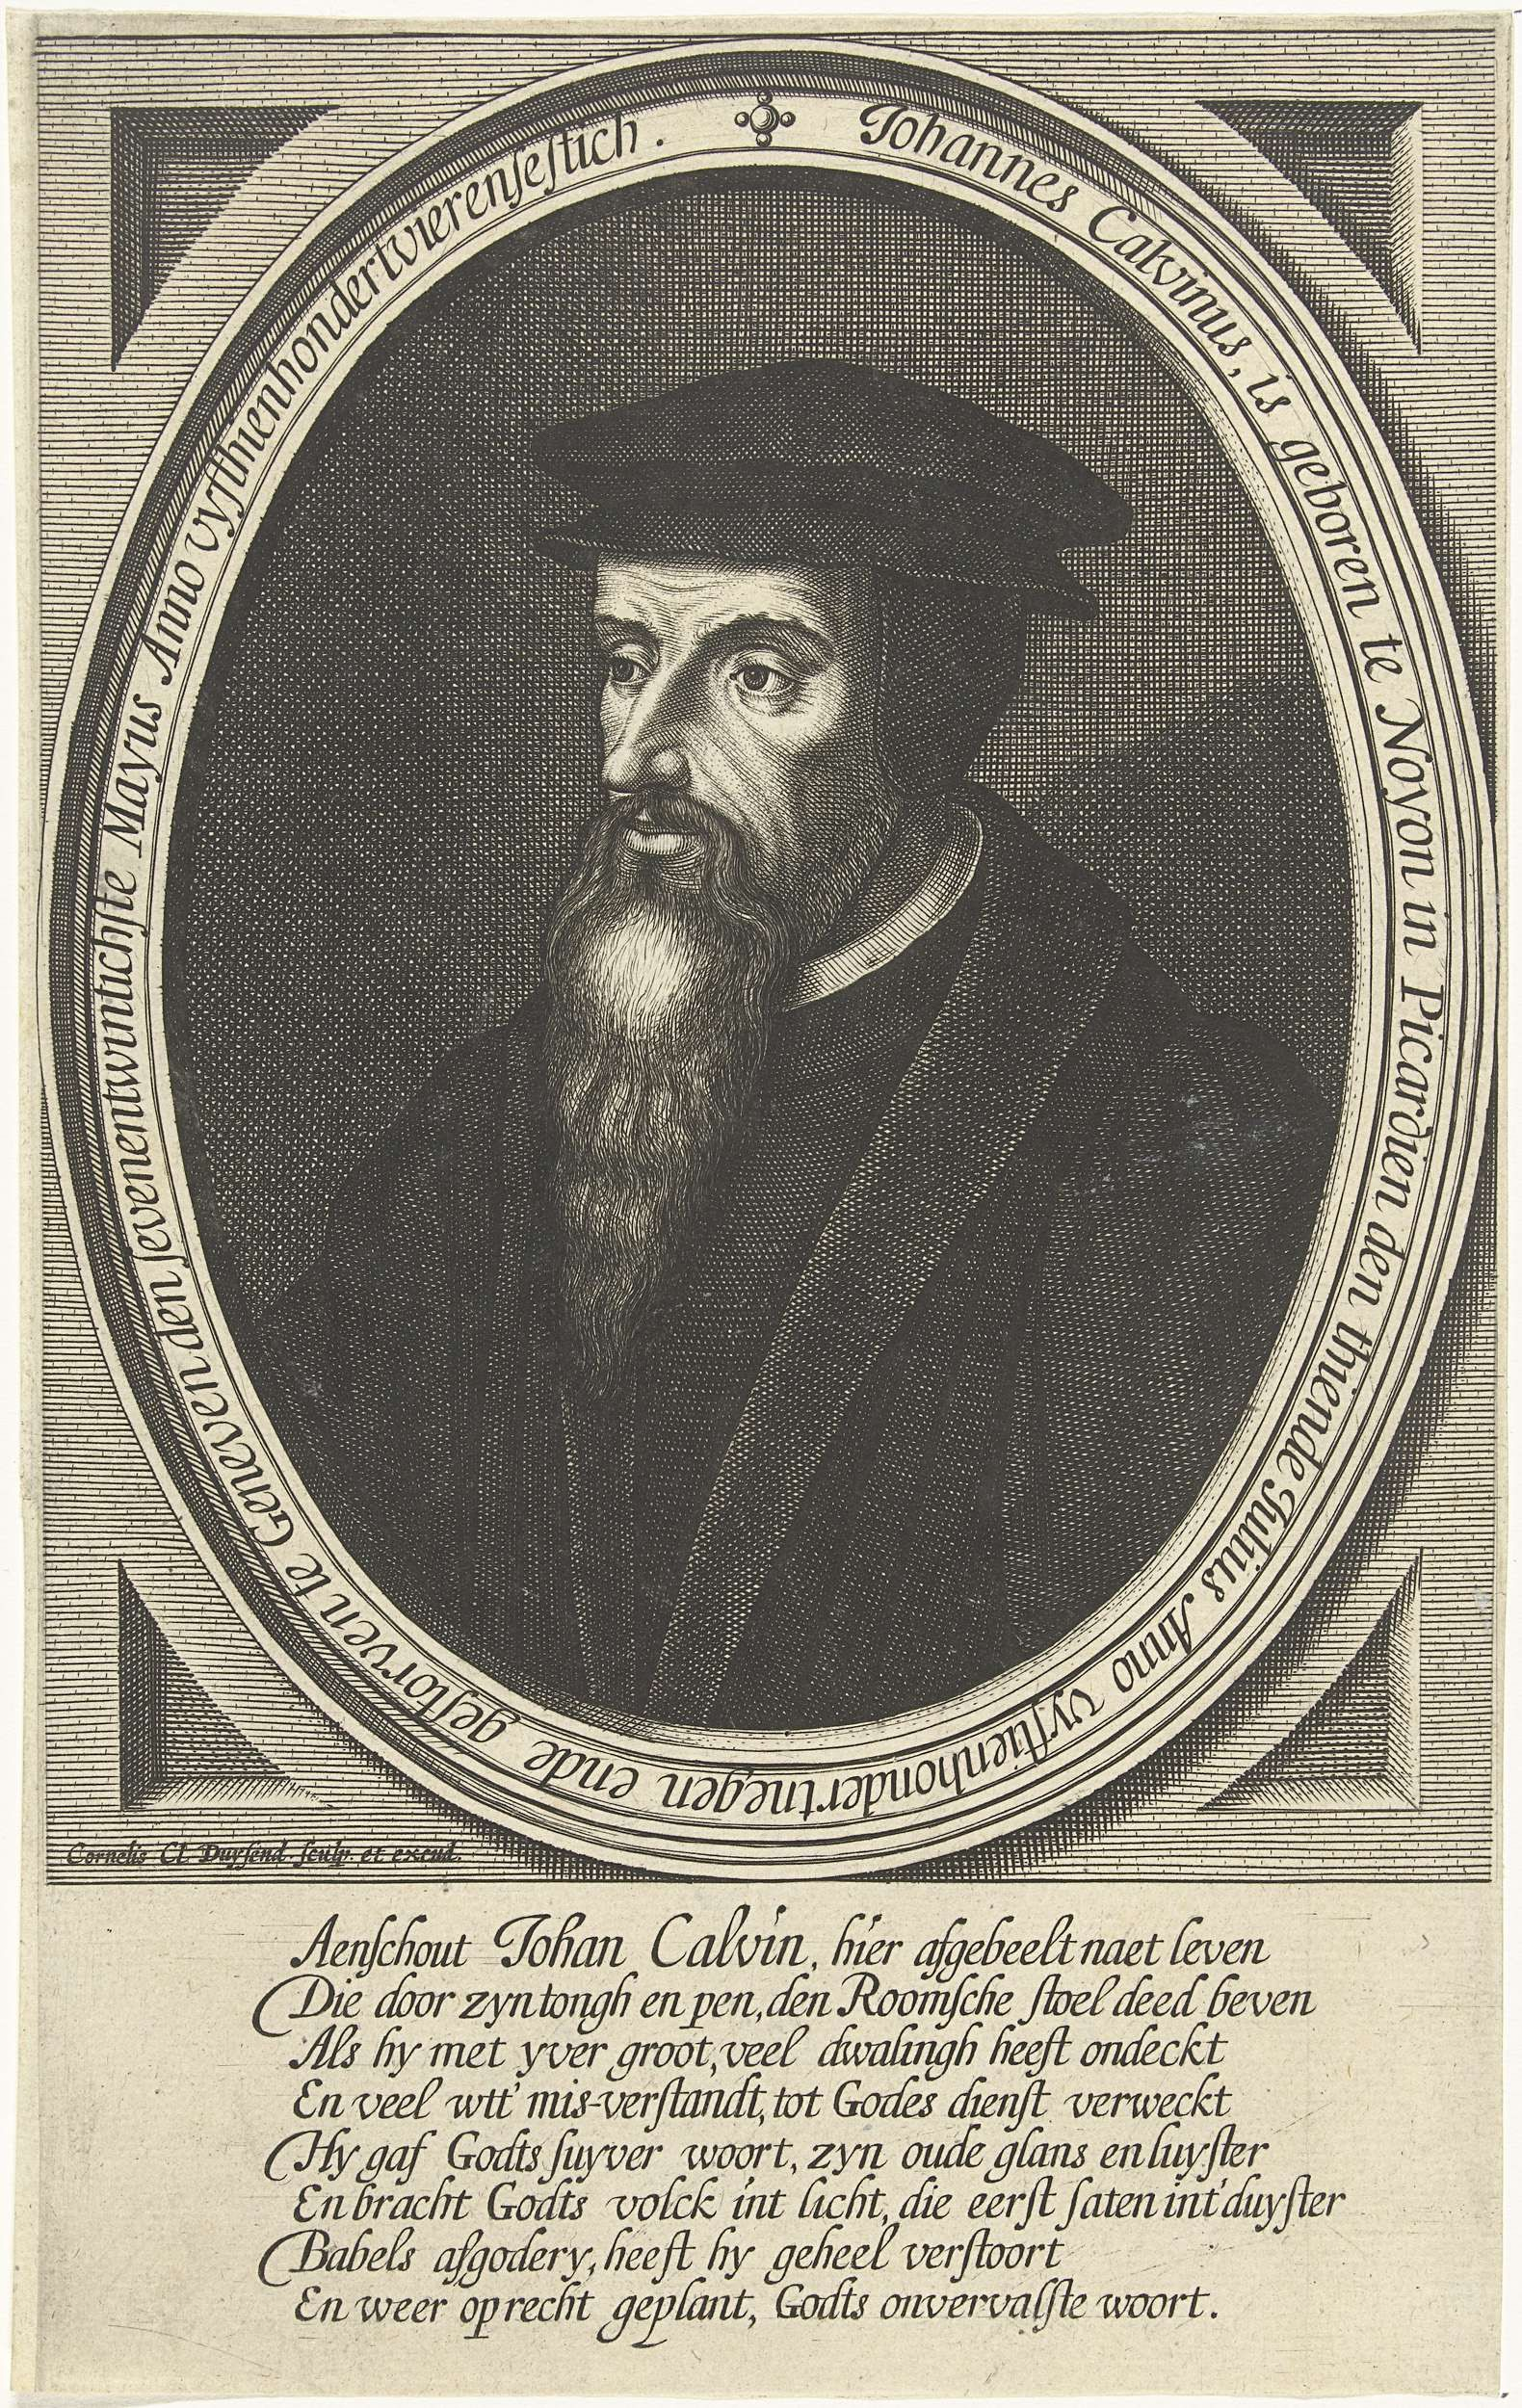 Portret van de reformator Johannes Calvijn, Cornelis Claesz. Duysend, 1630 - 1641